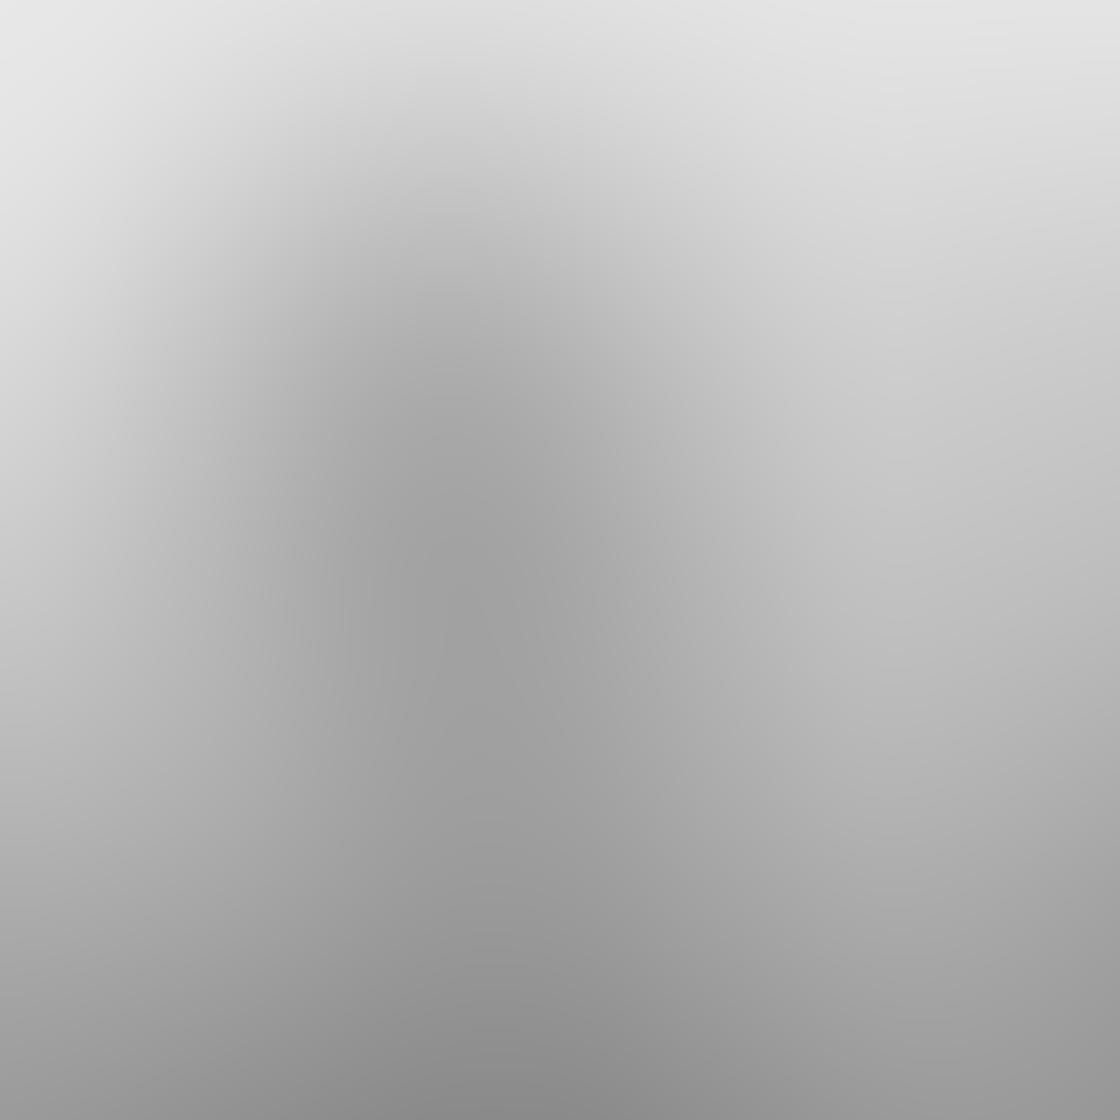 iPhone Weather Photo 15